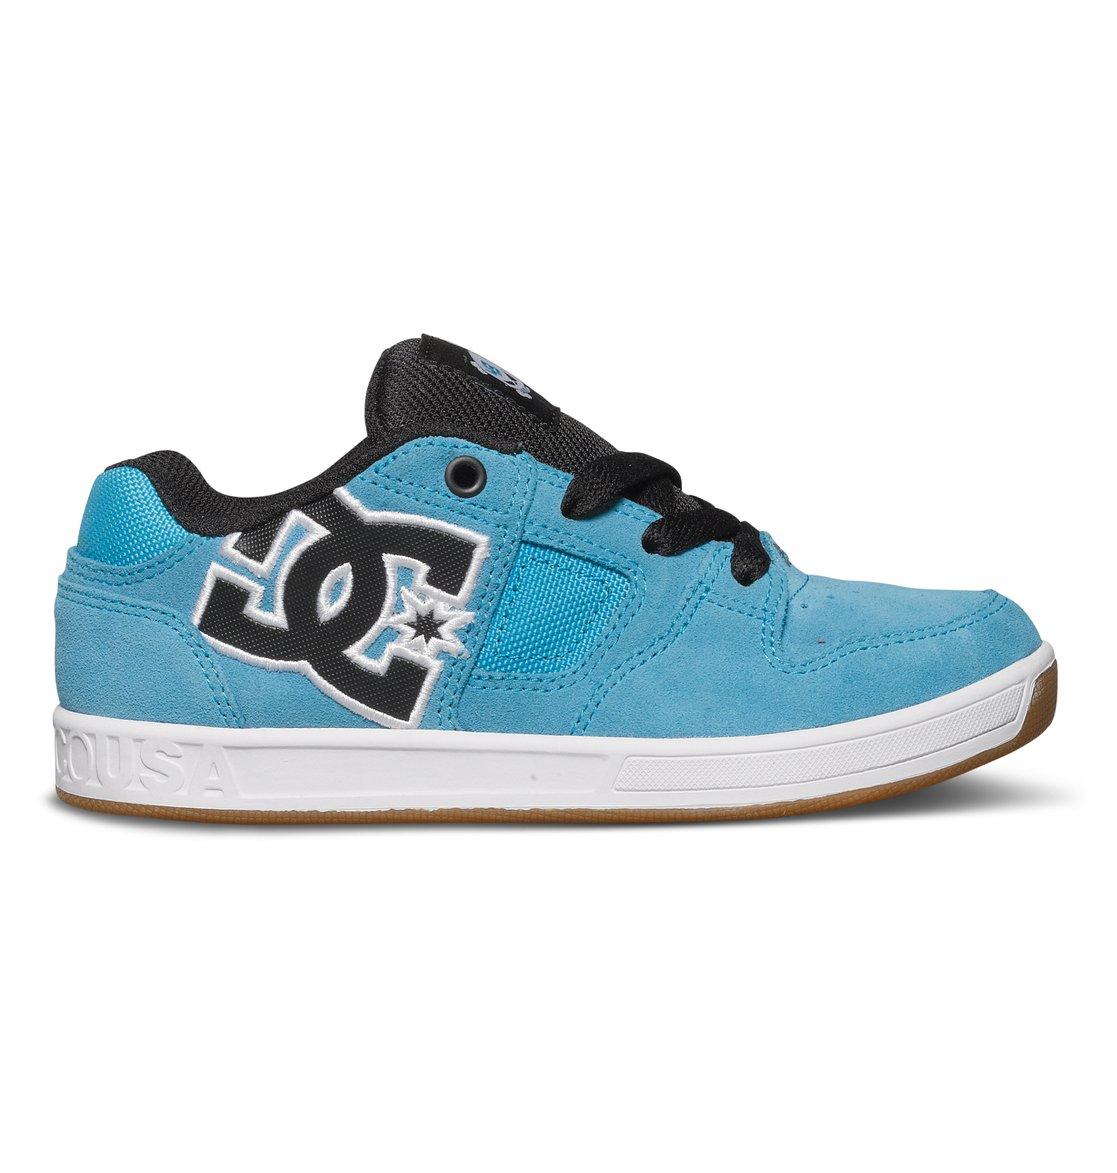 wholesale dealer a381a 12aae Sceptor Ken Block ADBS100134   DC Shoes